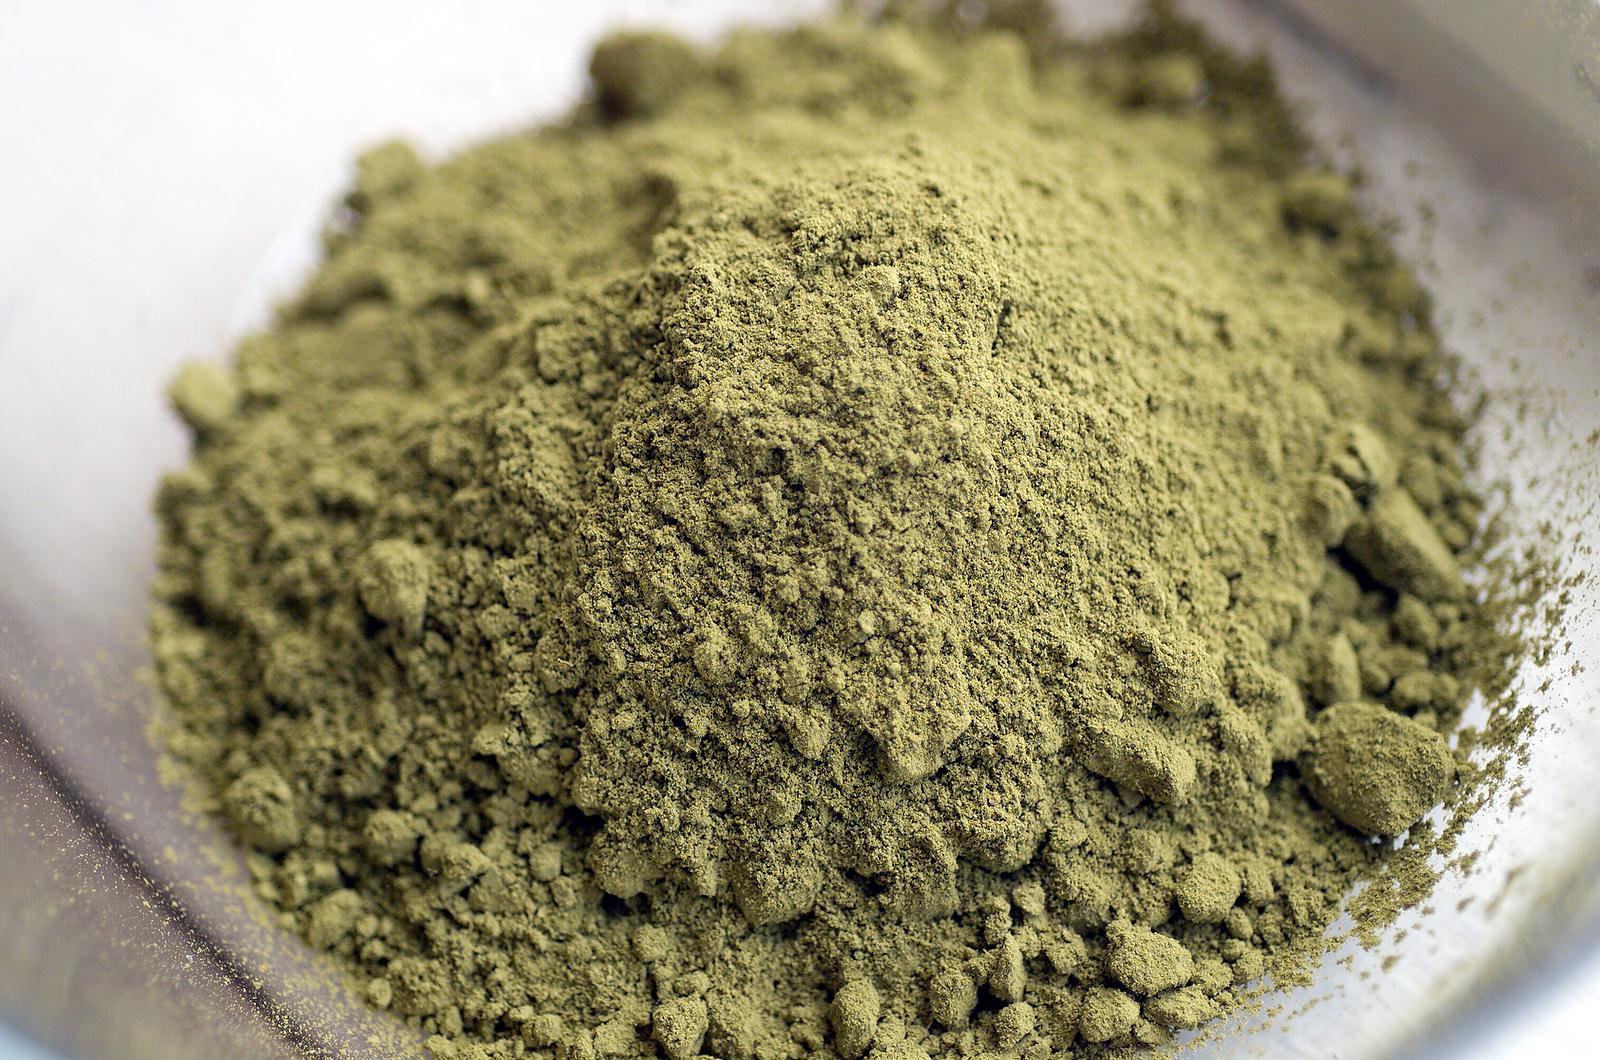 Harina de marihuana marihuana medicinal - I diversi tipi di droga ...